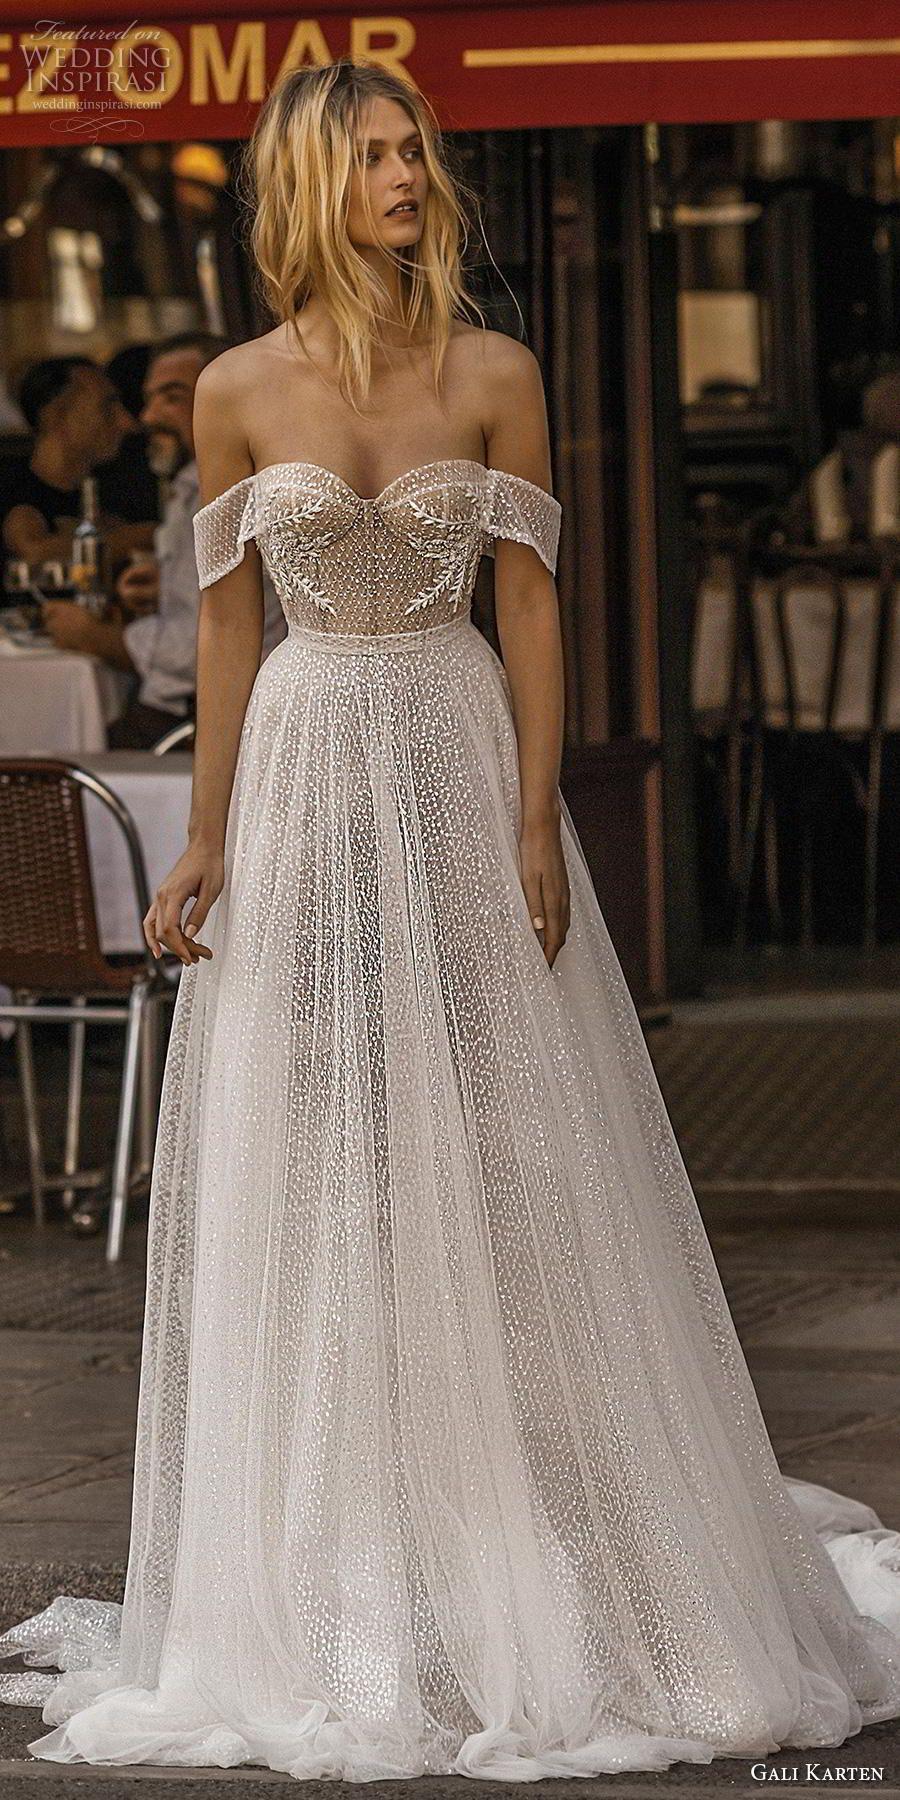 Gali karten wedding dresses u ucparisud bridal collection in